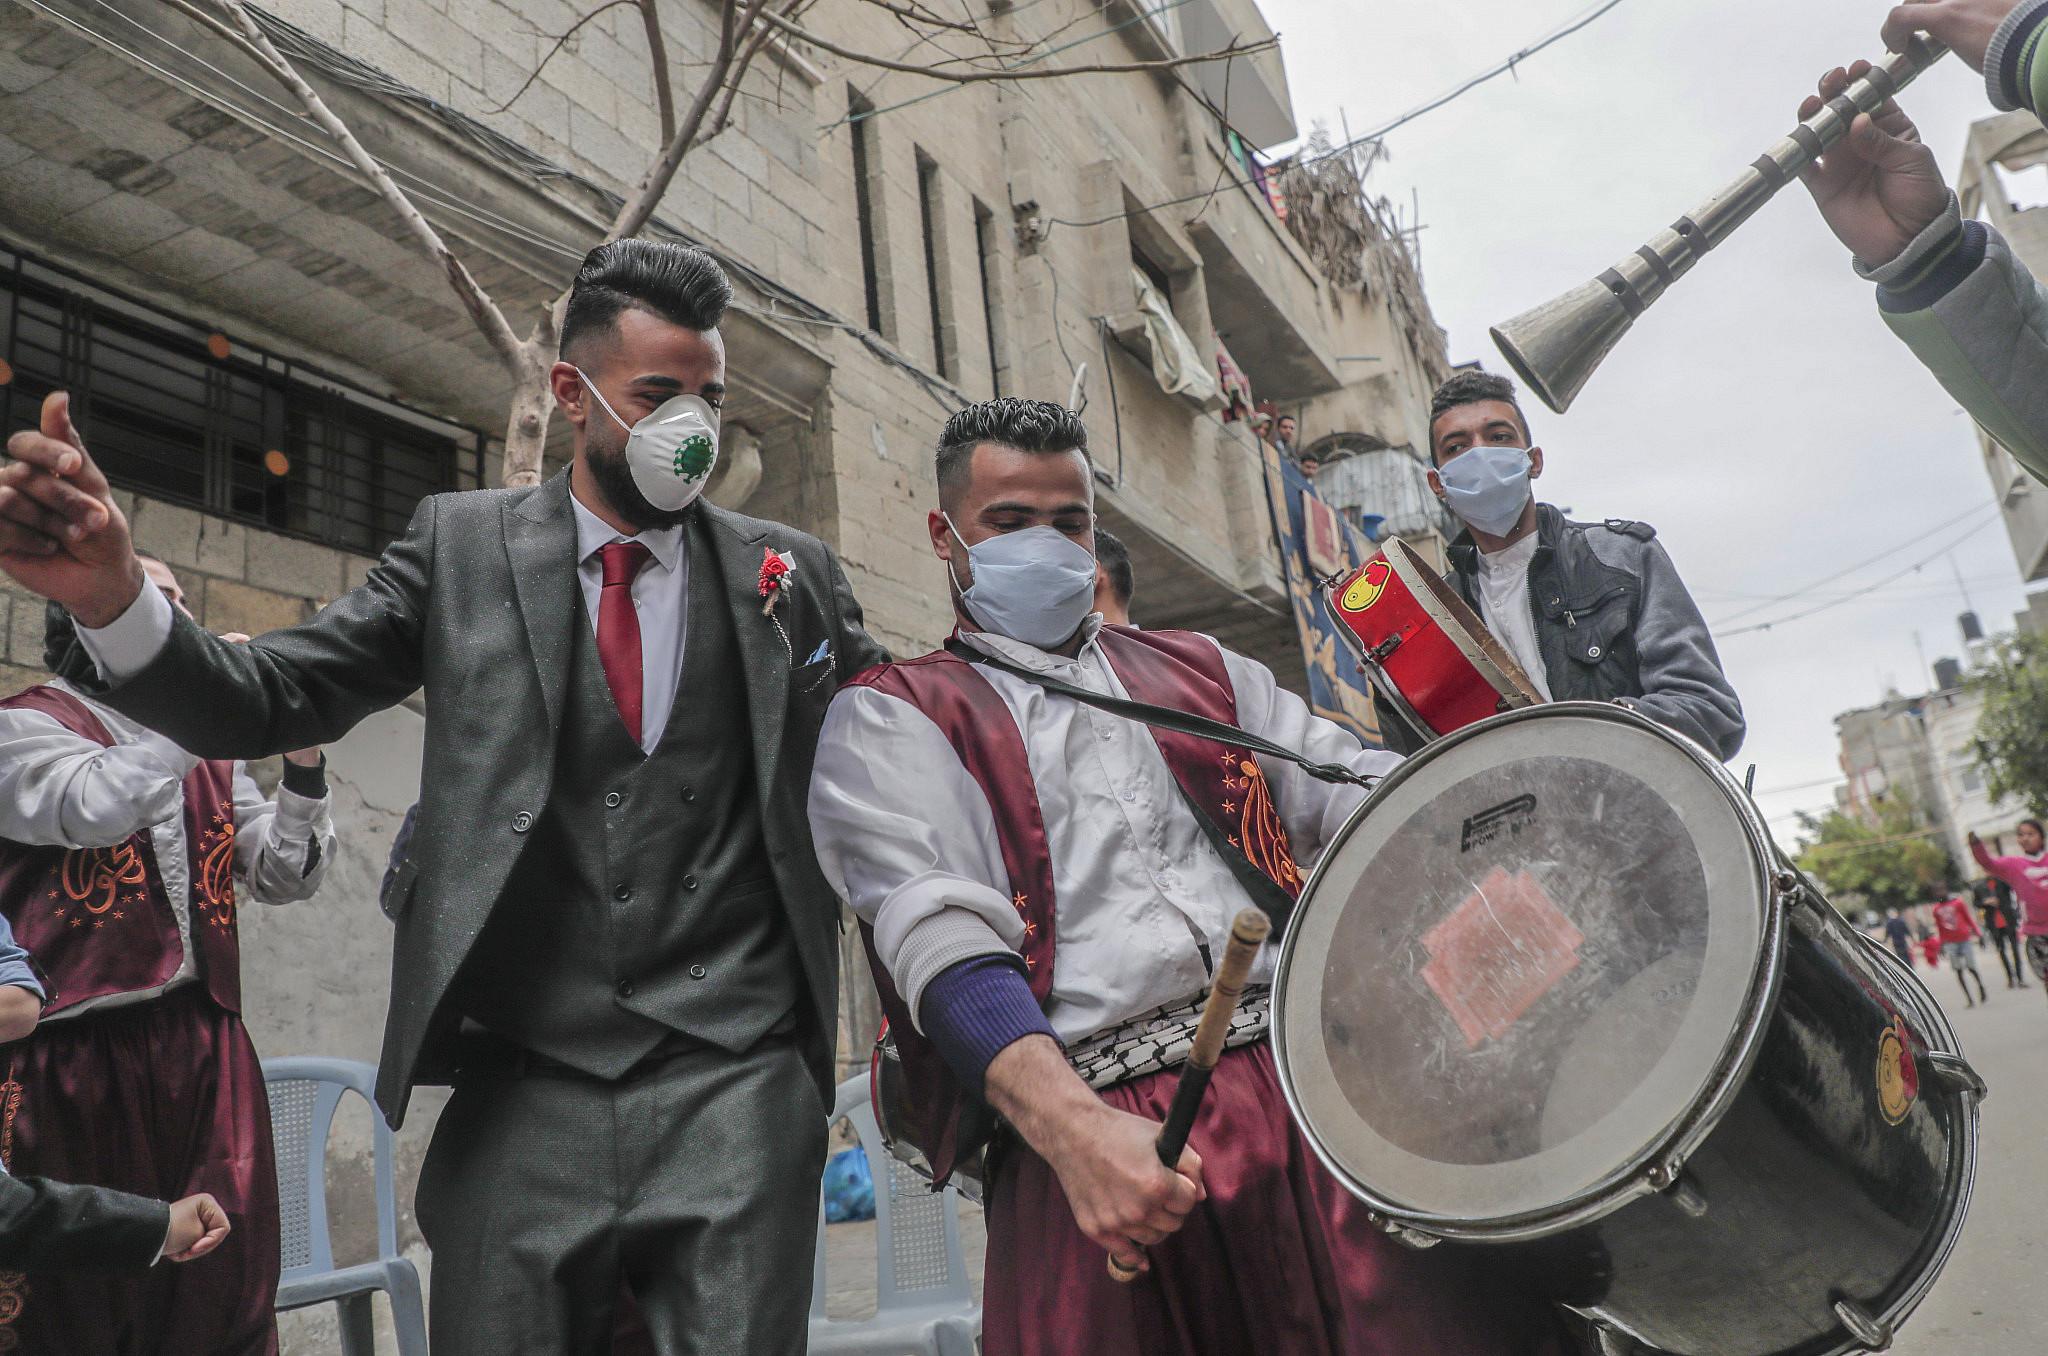 The groom Ali Abu Seif on the day of his wedding under quarantine, Gaza City, April 10, 2020. (Mohammed Zaanoun)